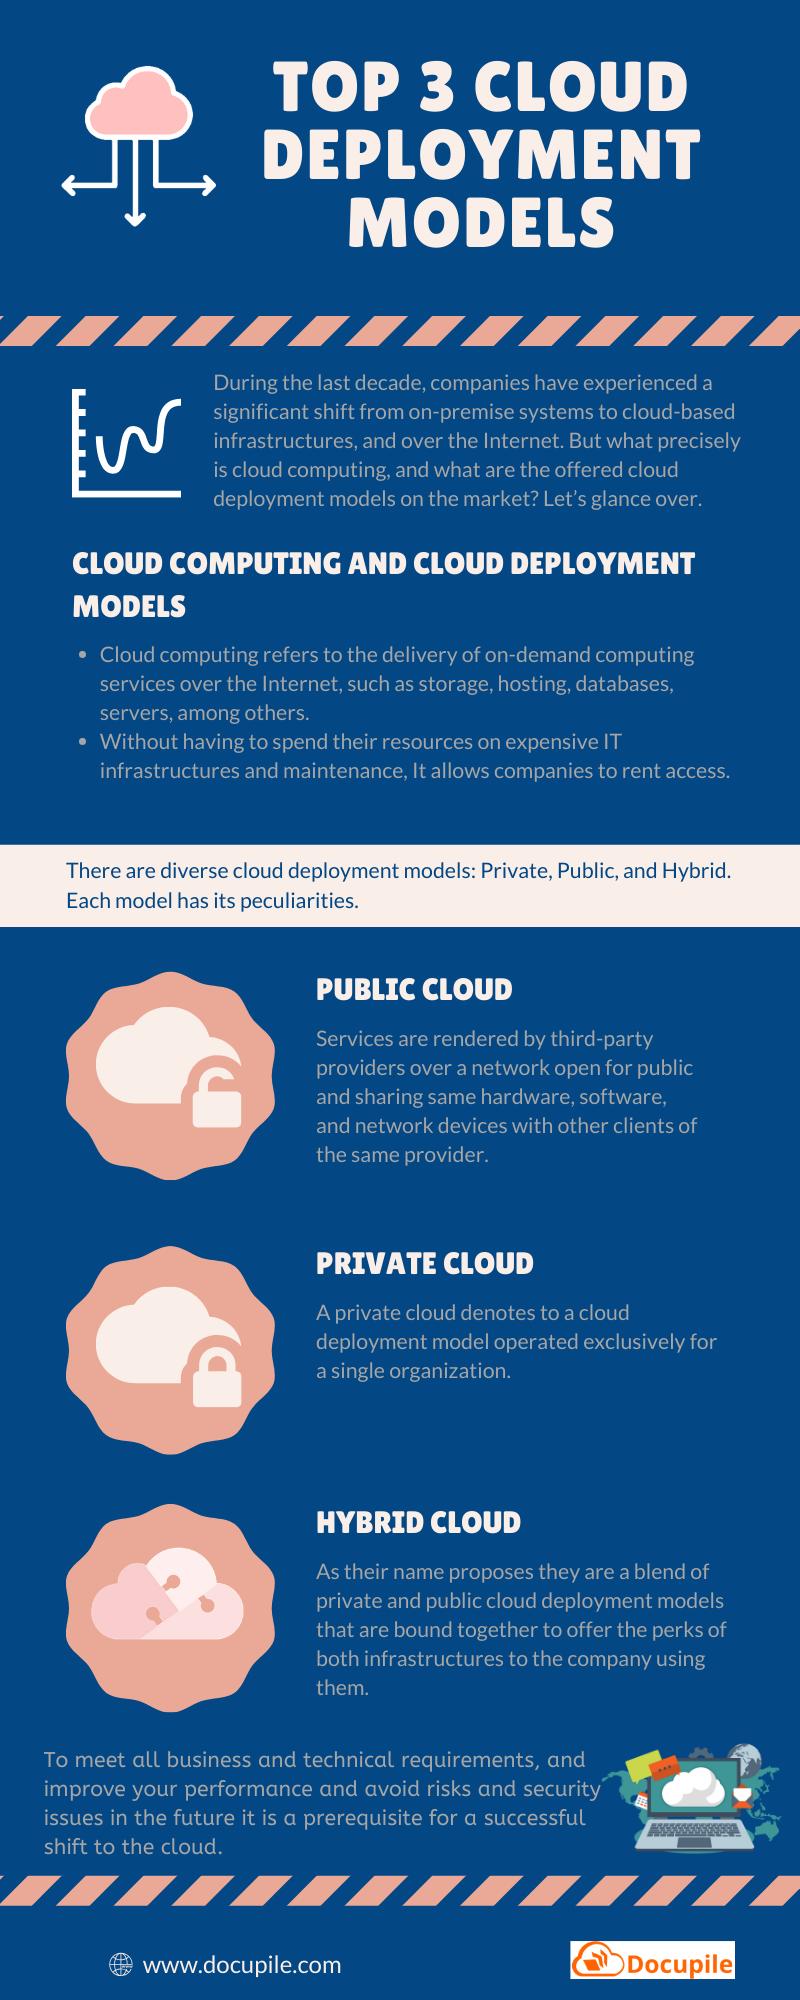 Top 3 Cloud Deployment Models by Docupile